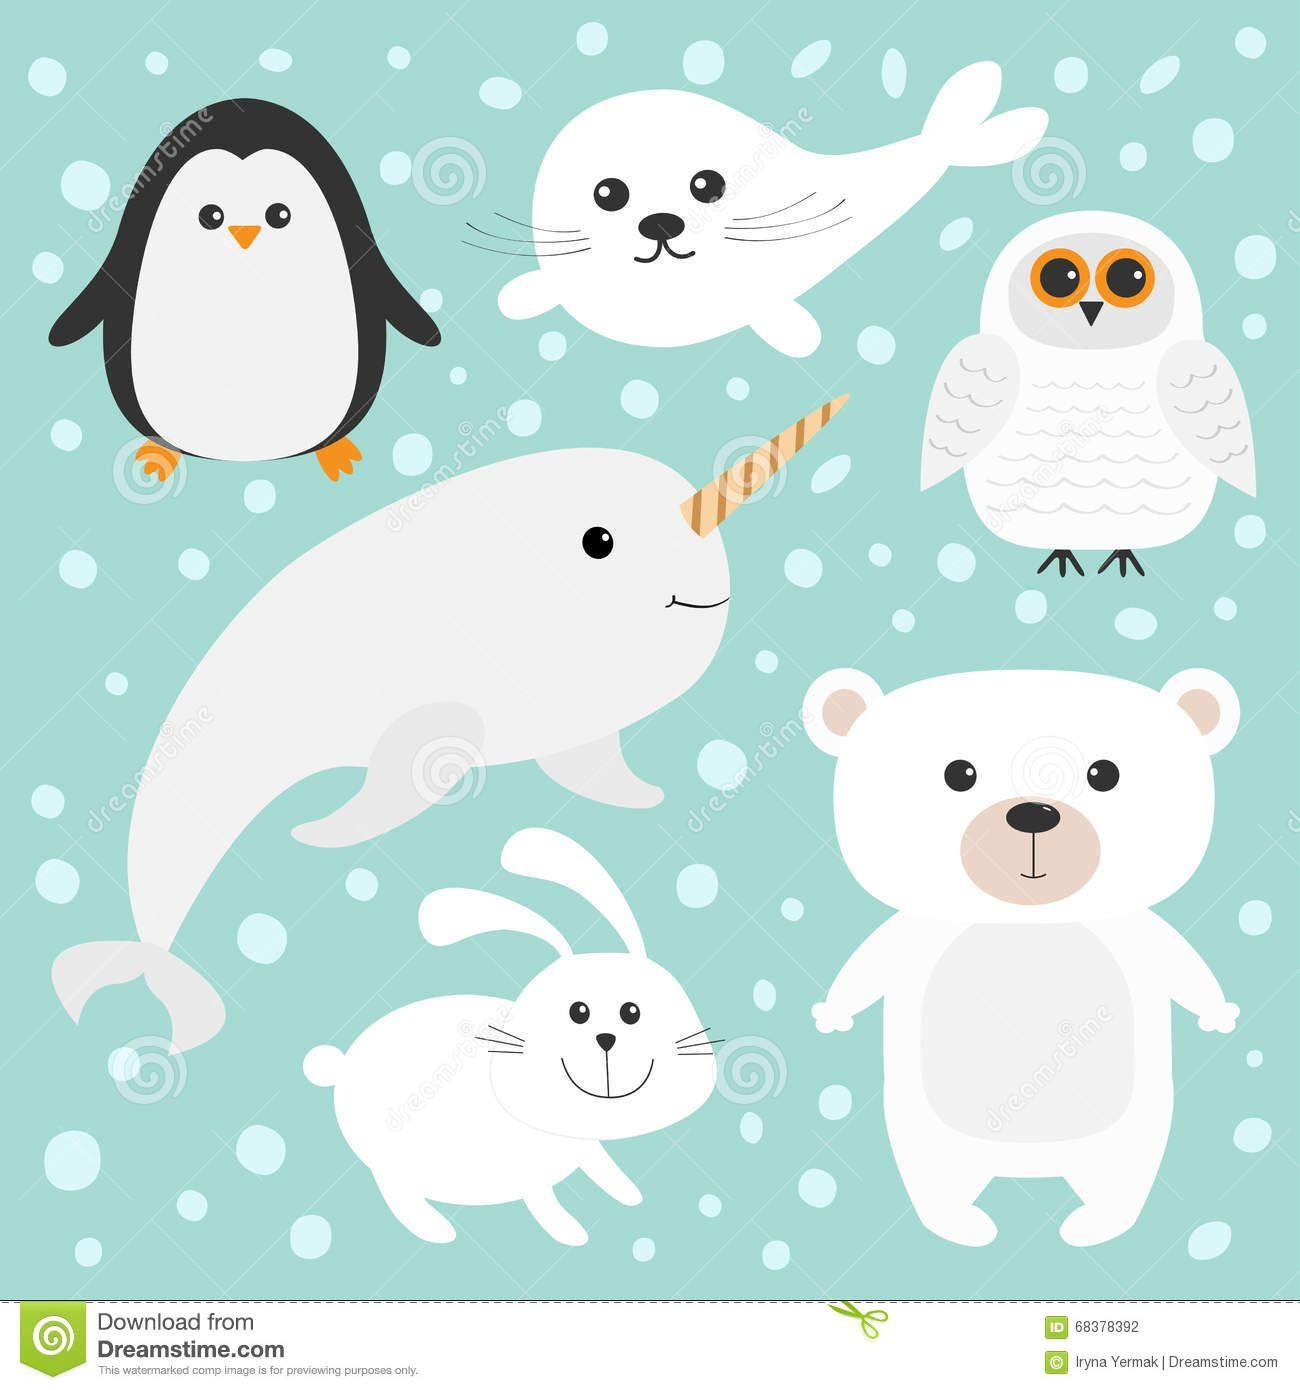 Ensemble Polaire Arctique D Animal Ours Blanc Hibou Pingouin Harpe De Bebe De Bebe Phoque Lievre Lapin Narval Licorn Polar Animals Unicorn Fish Seal Pup